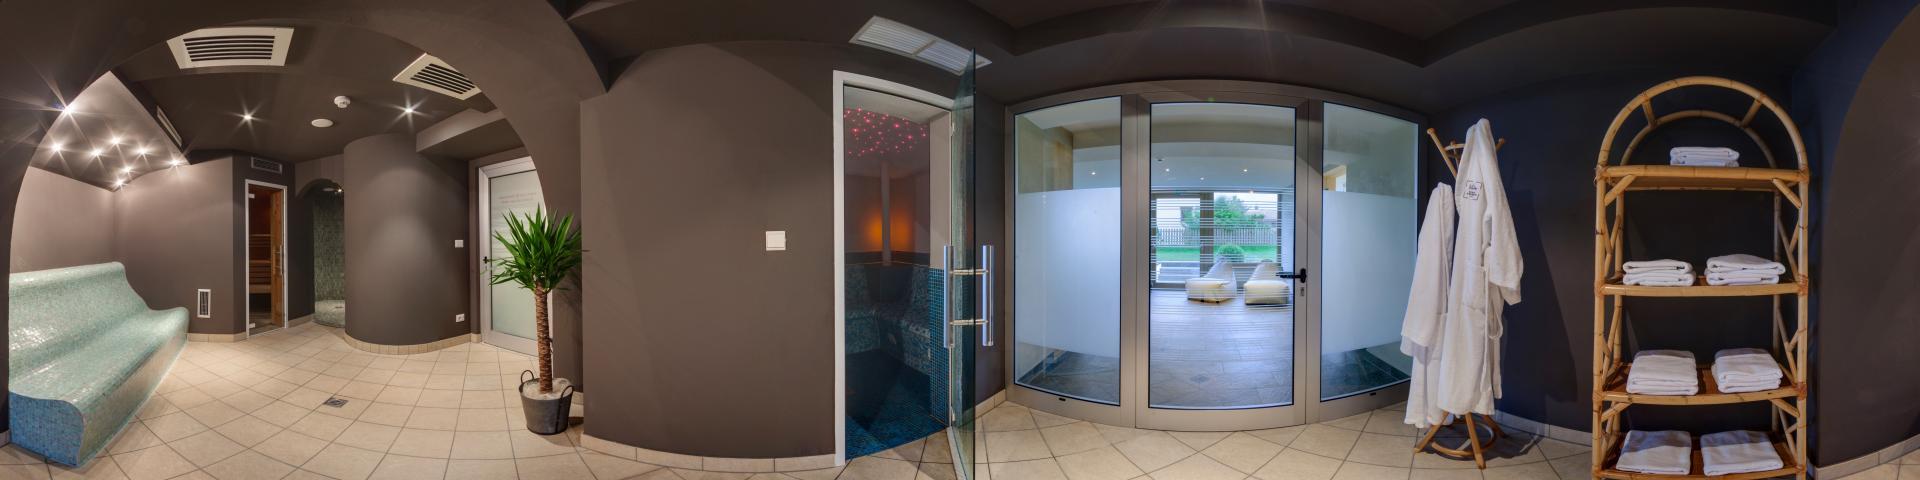 sauna_ug_cube_equi.jpg